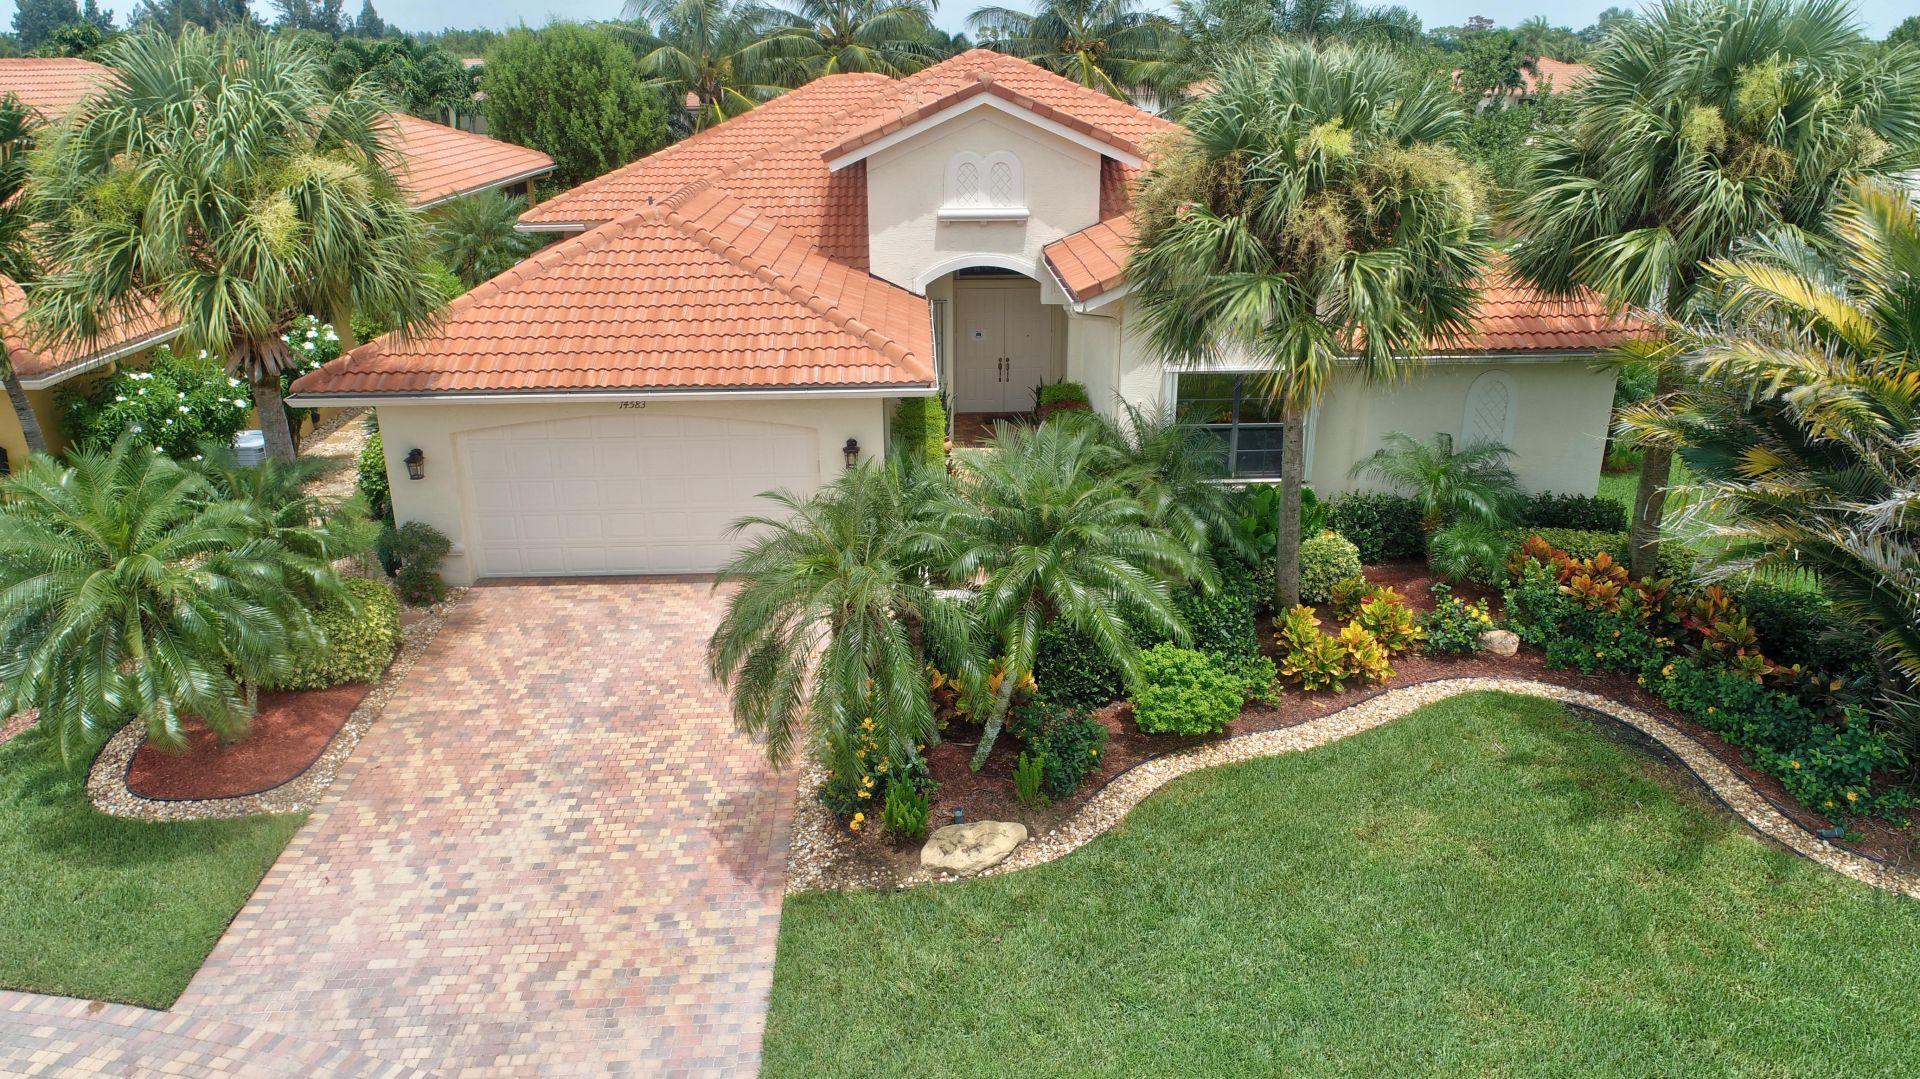 Photo of 14583 Jetty Lane, Delray Beach, FL 33446